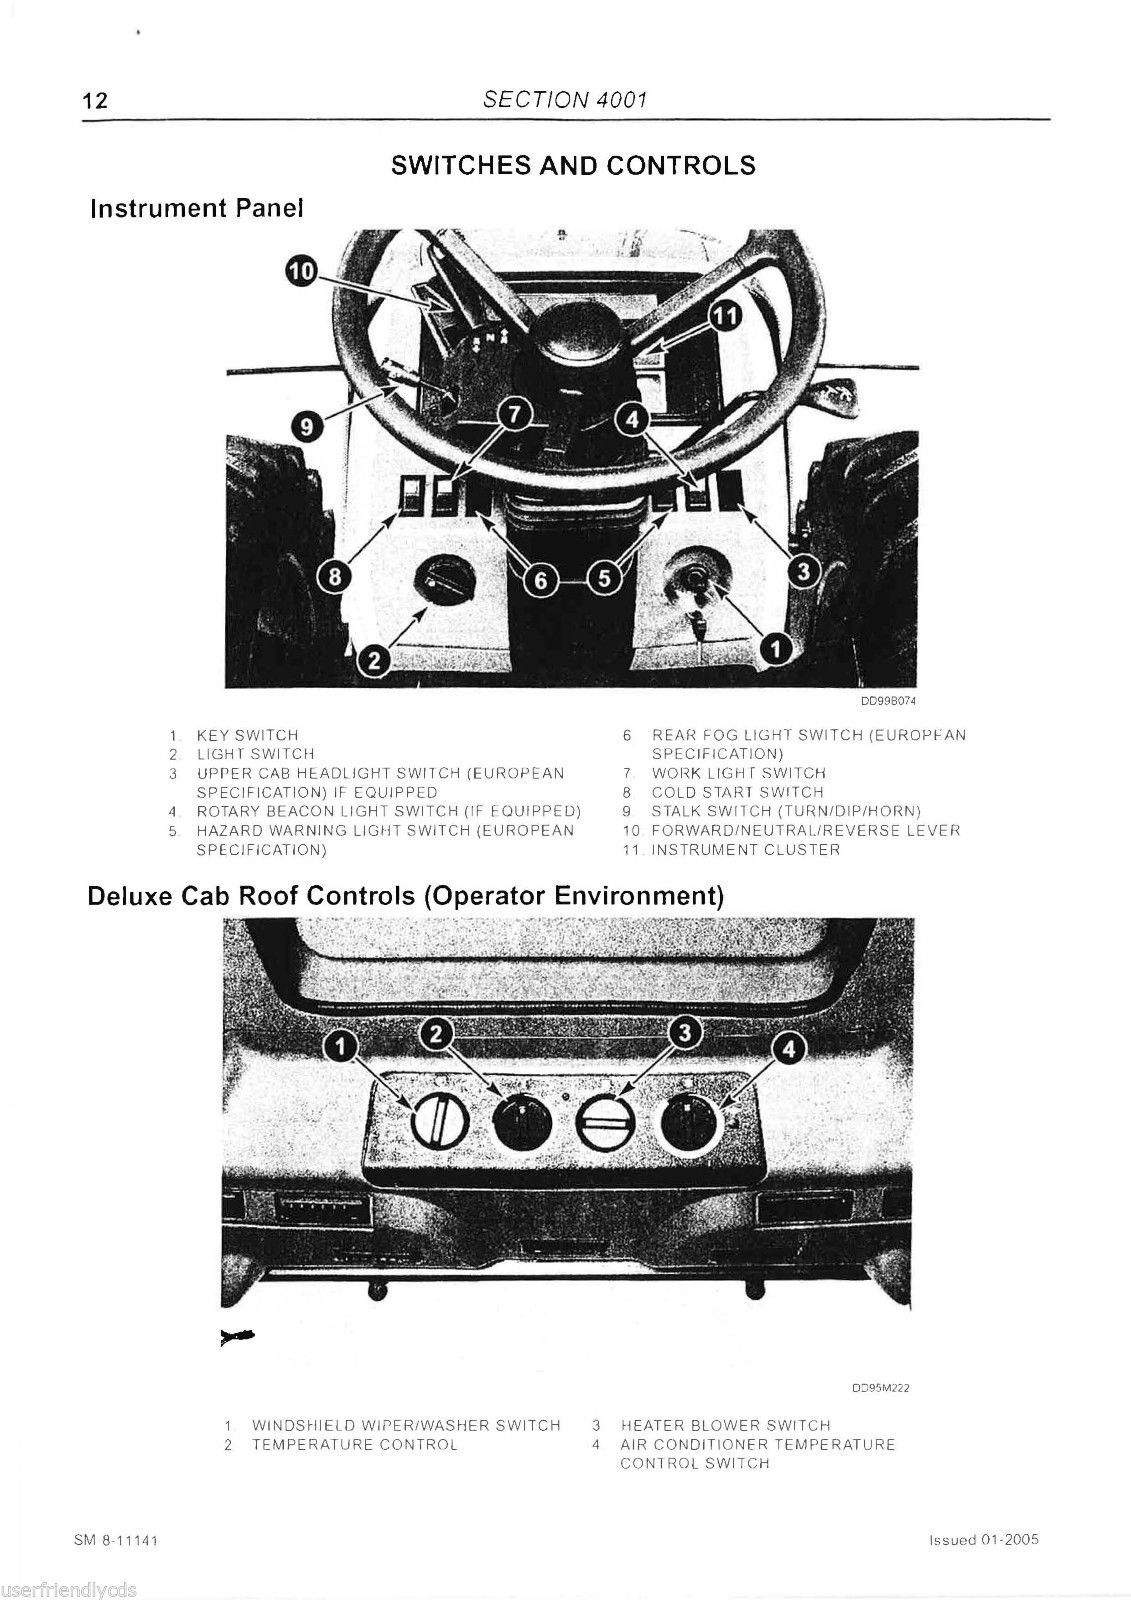 McCormick MTX MTX135 MTX140 MTX150 Tractor Service & Operator Manual -4- MANUALS image 6